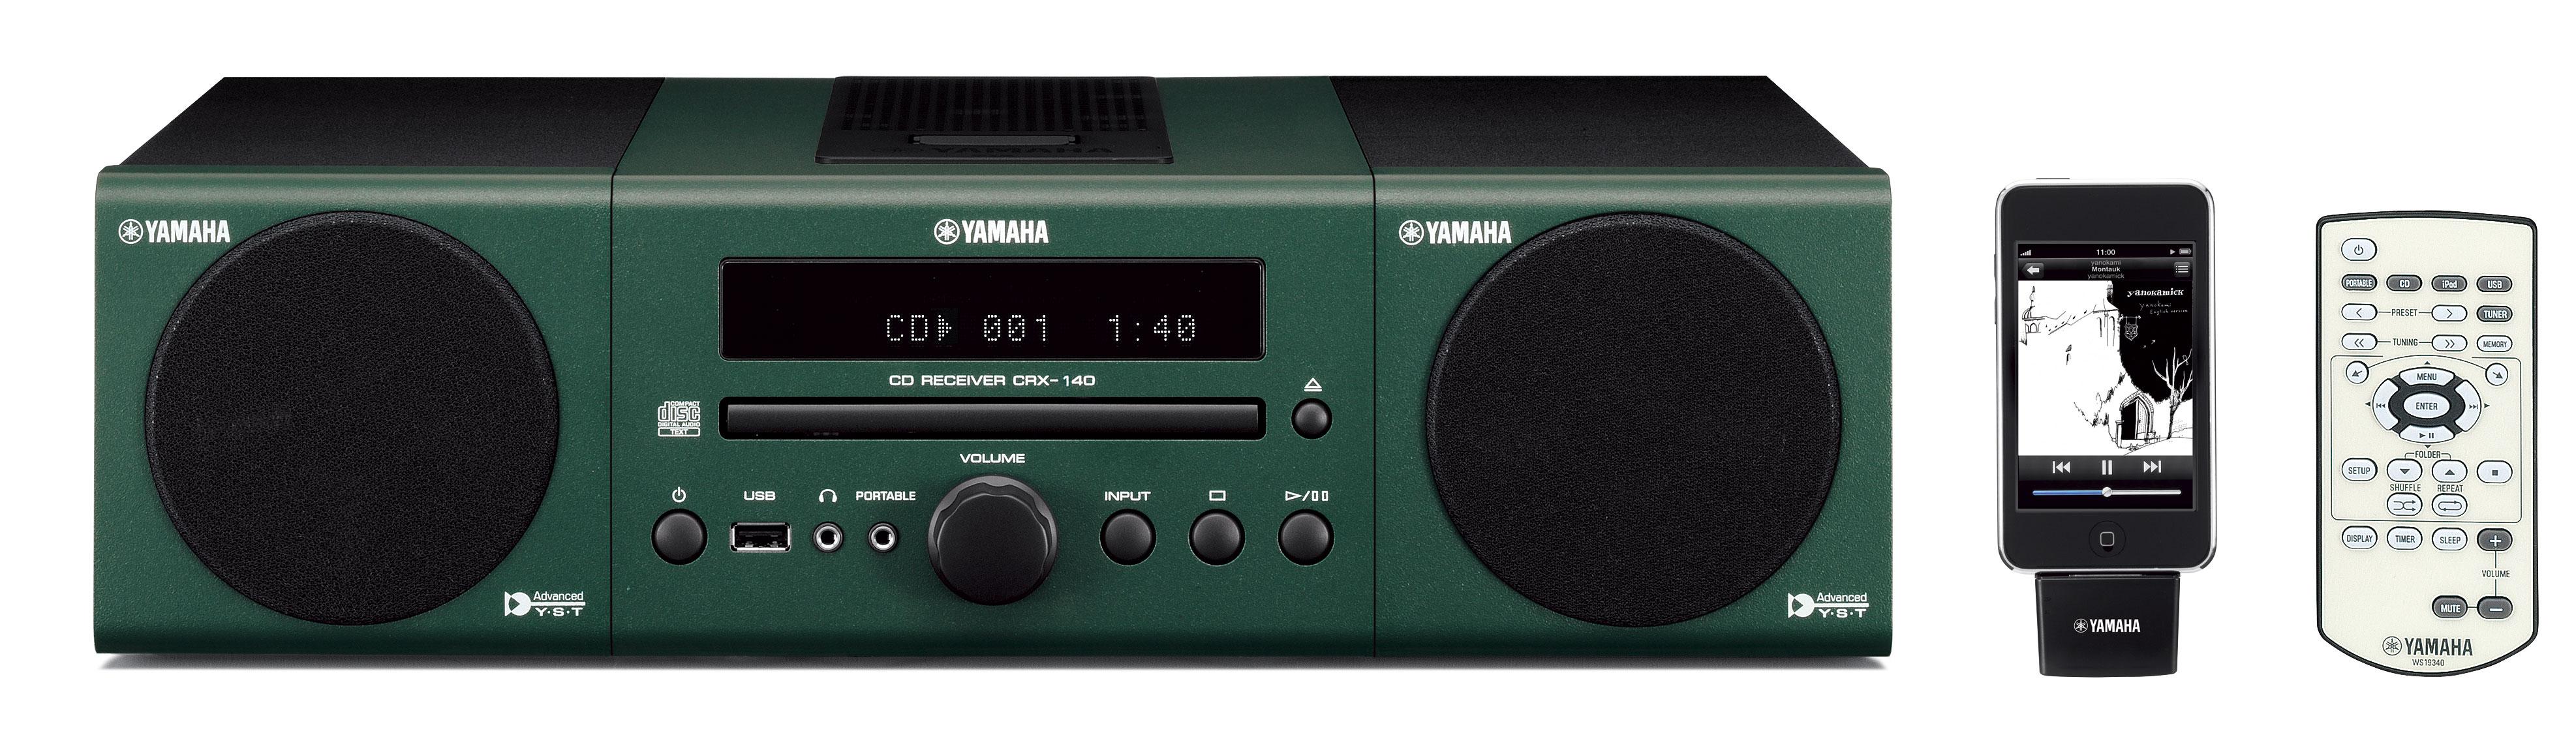 Fotovergrößerung - MCR-140 - HiFi-Systeme - Yamaha ... Yamaha Audio